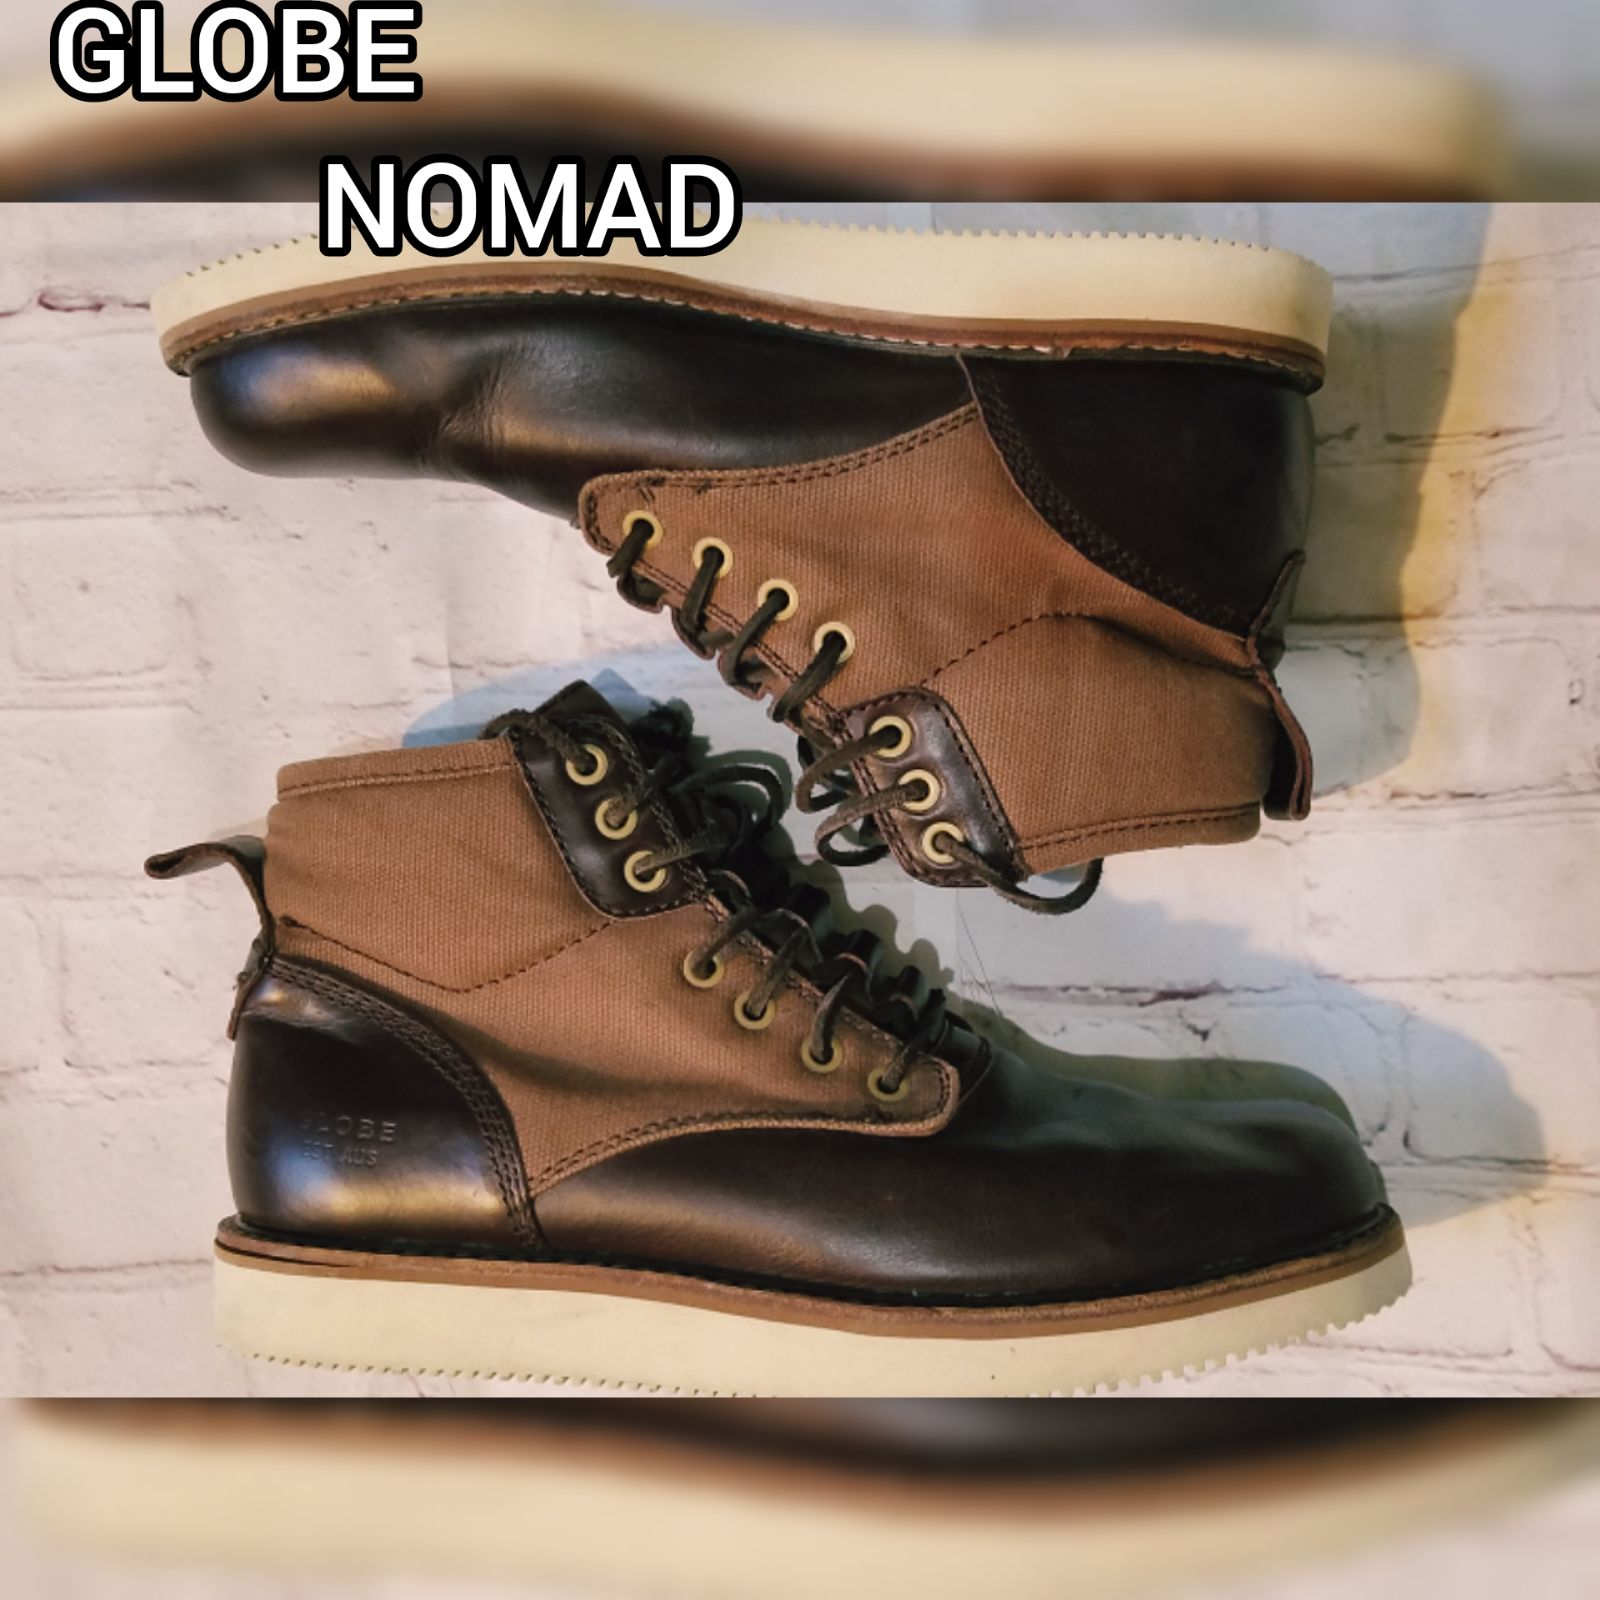 Globe Nomad Boots